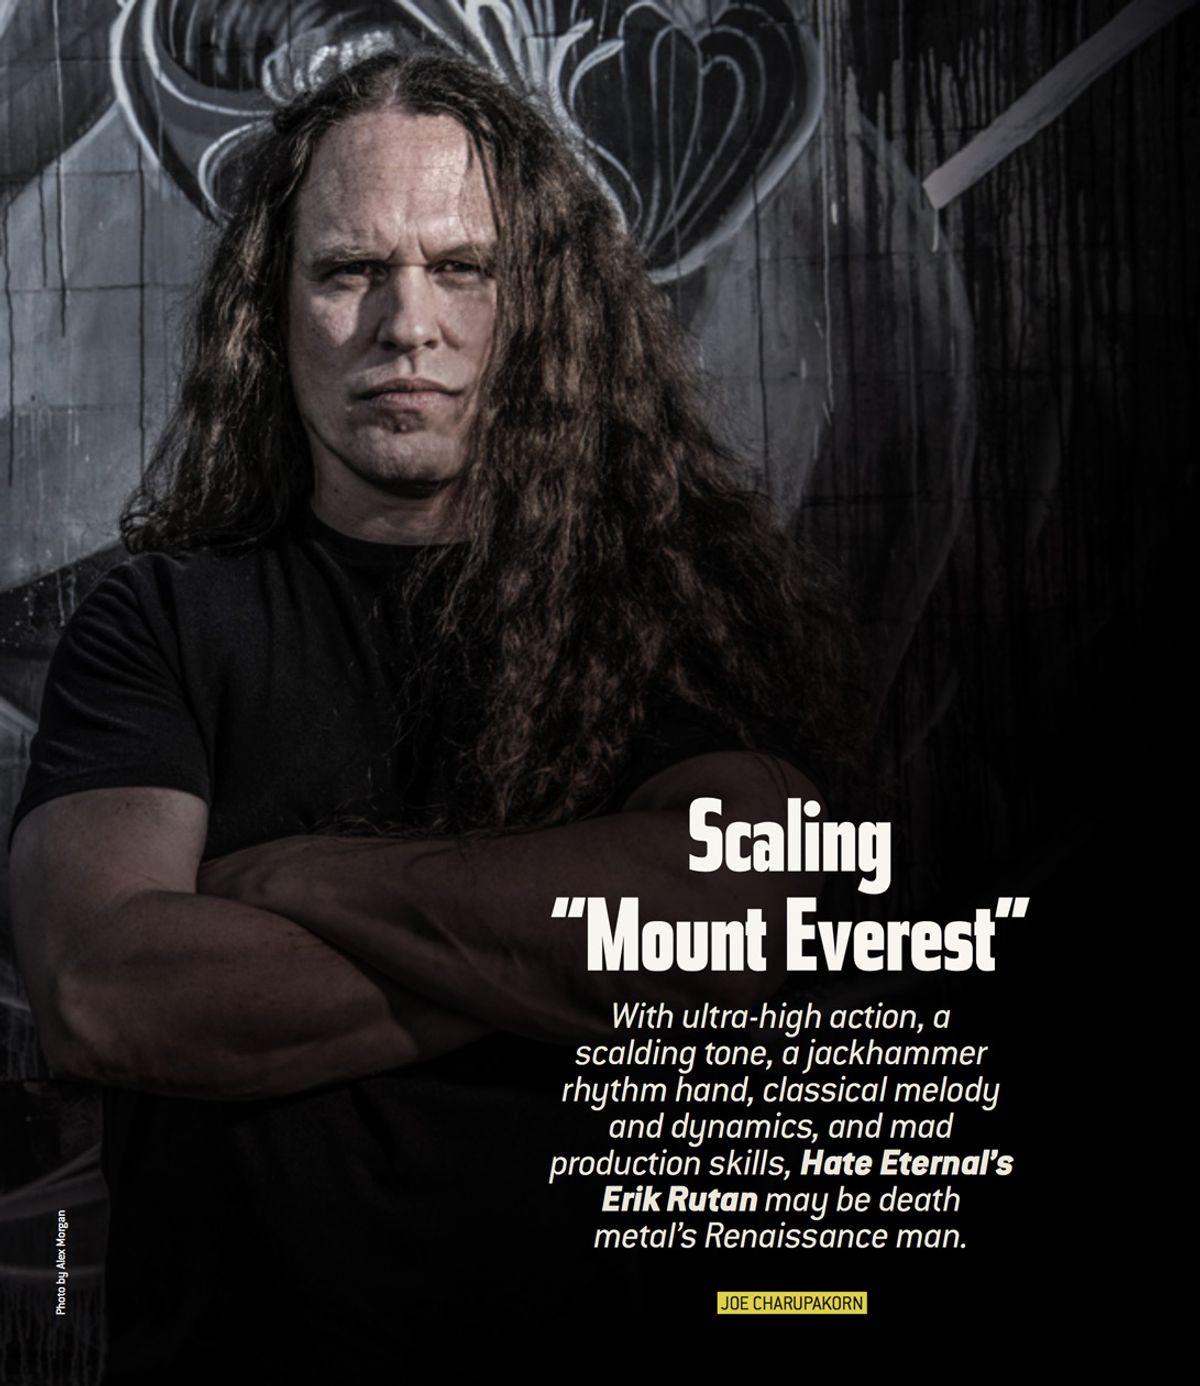 Is Erik Rutan Death Metal's Renaissance Man?